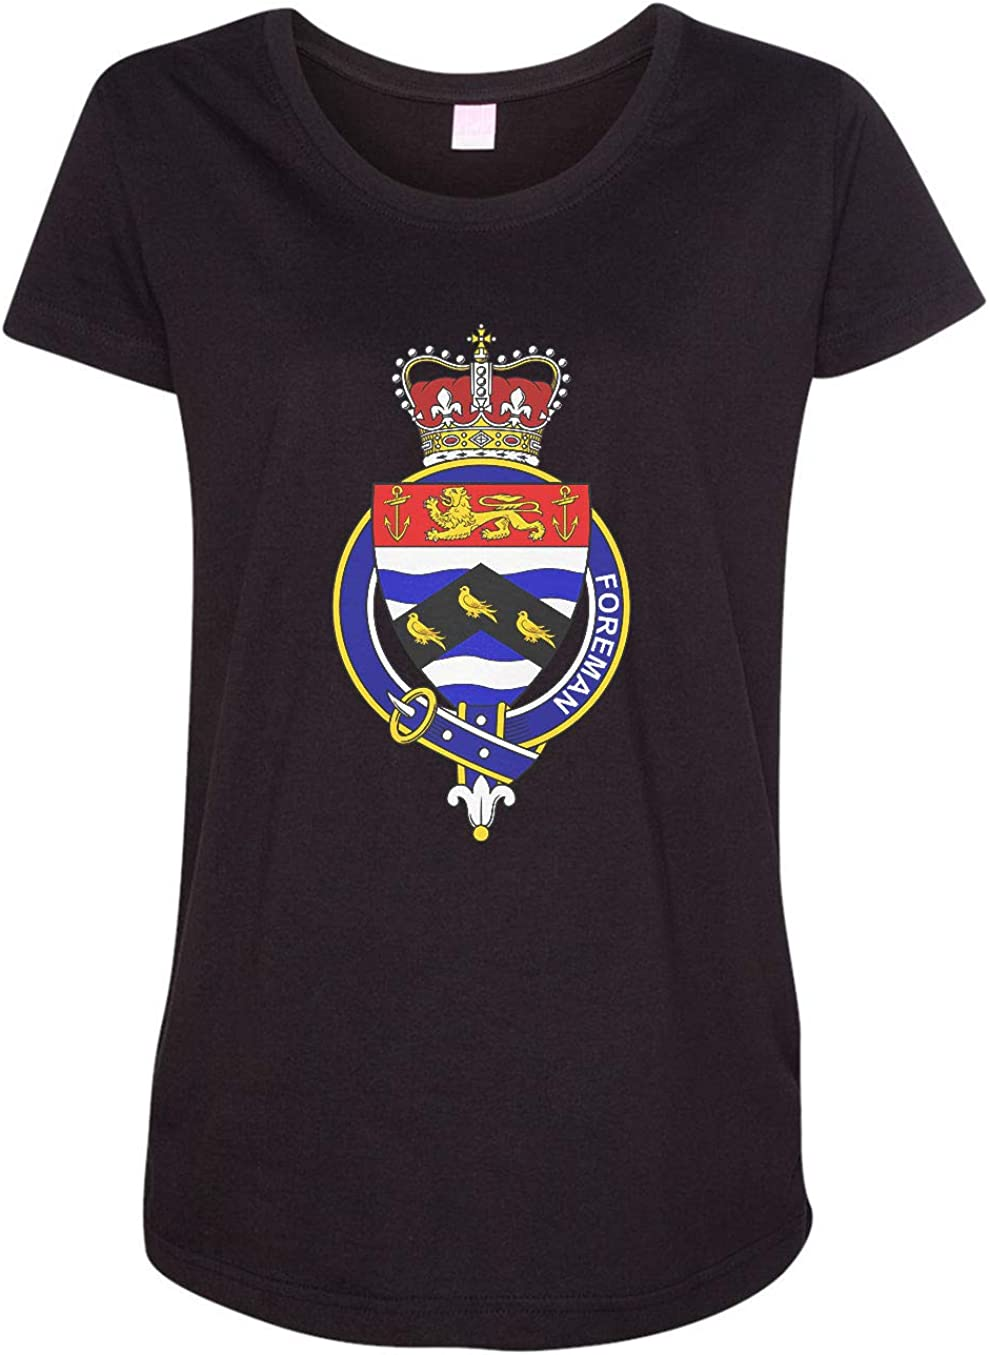 HARD EDGE DESIGN Women's English Garter Family Foreman T-Shirt